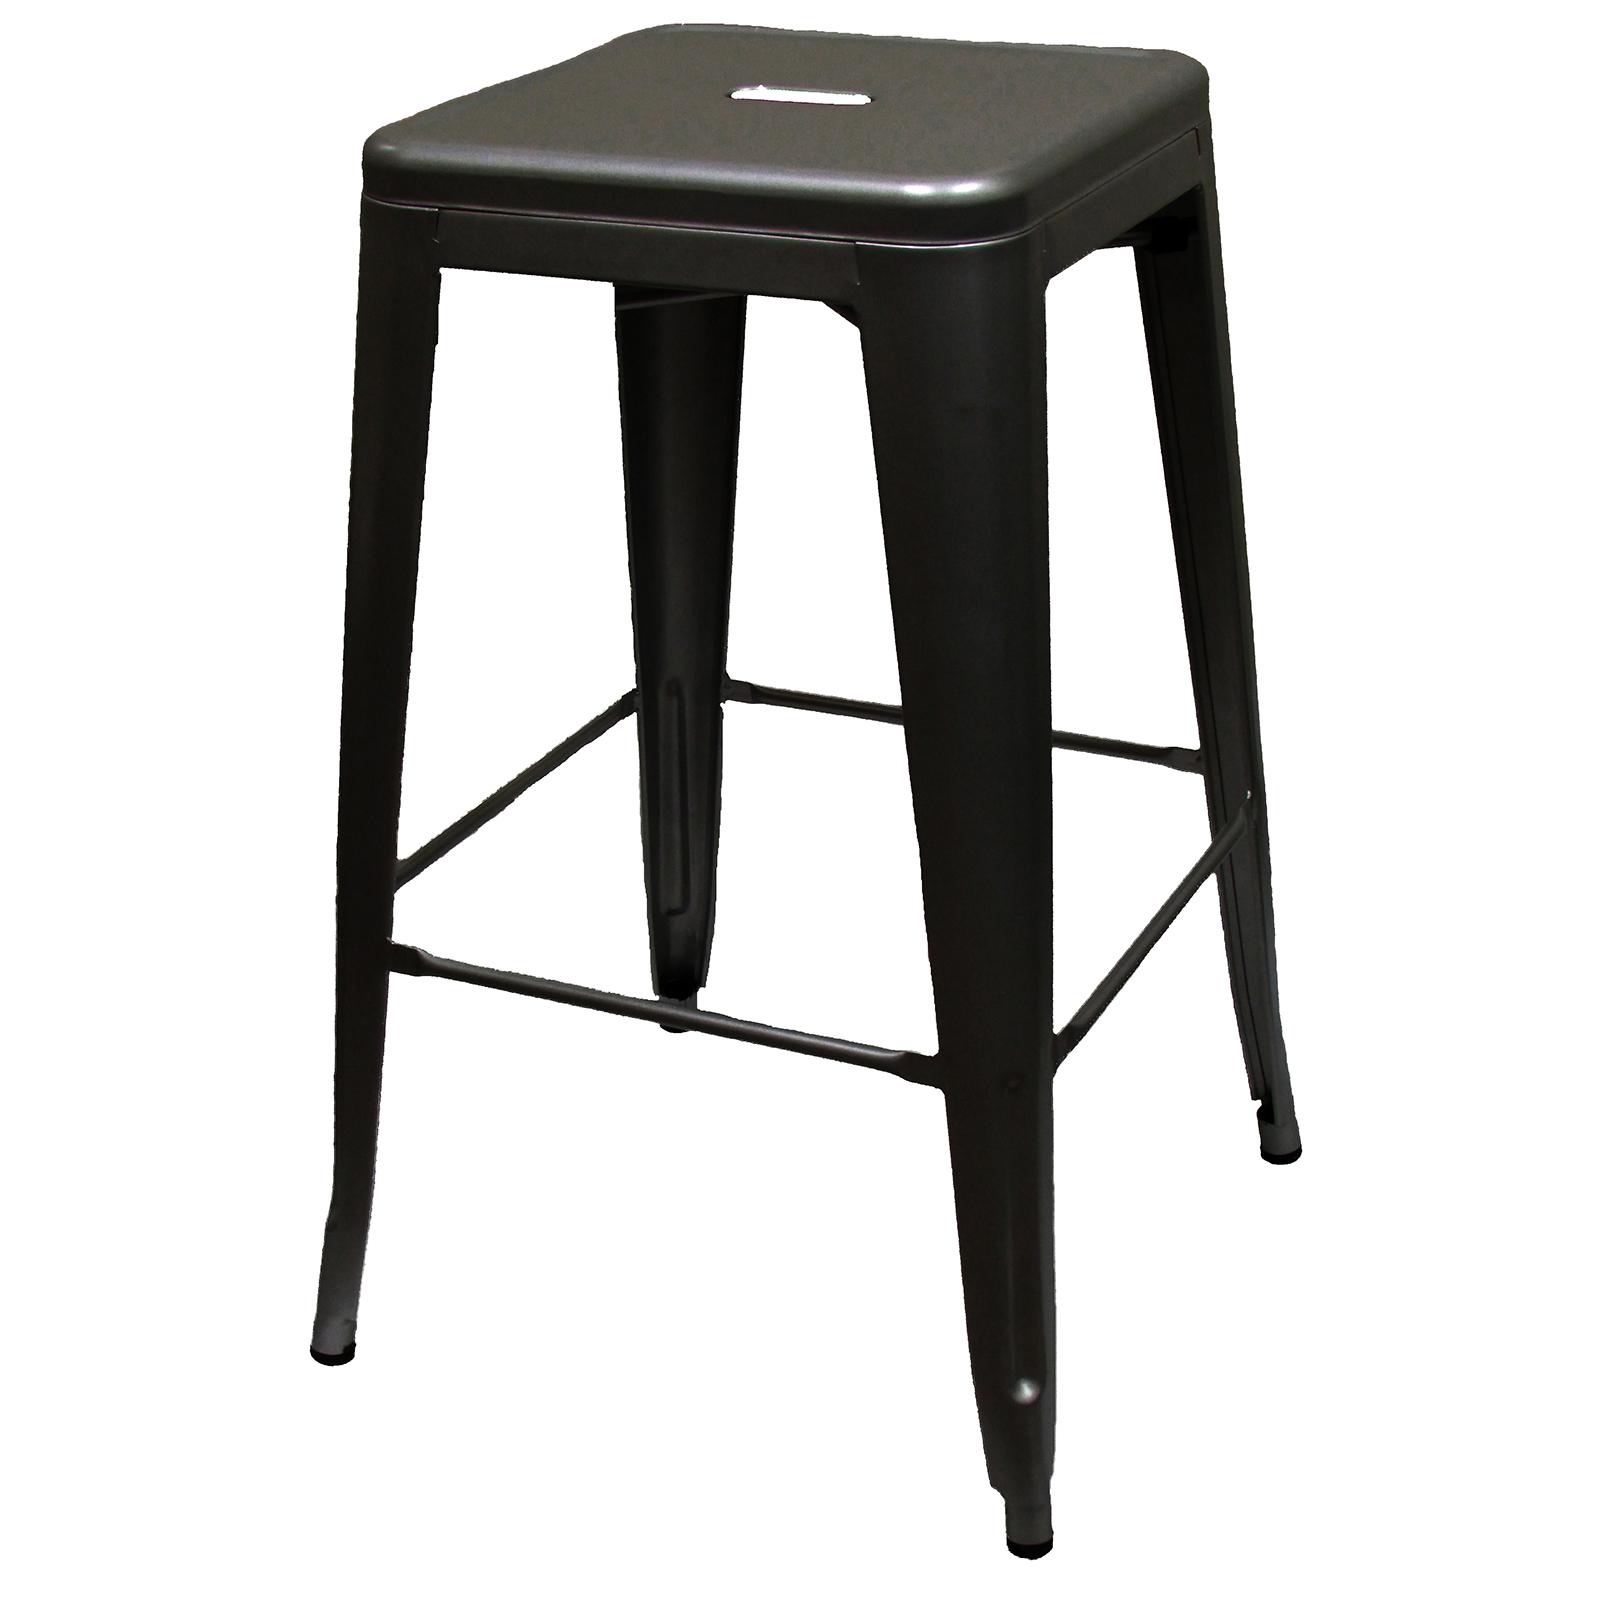 Oak Street BB-820-BLK-XL bar stool, stacking, indoor